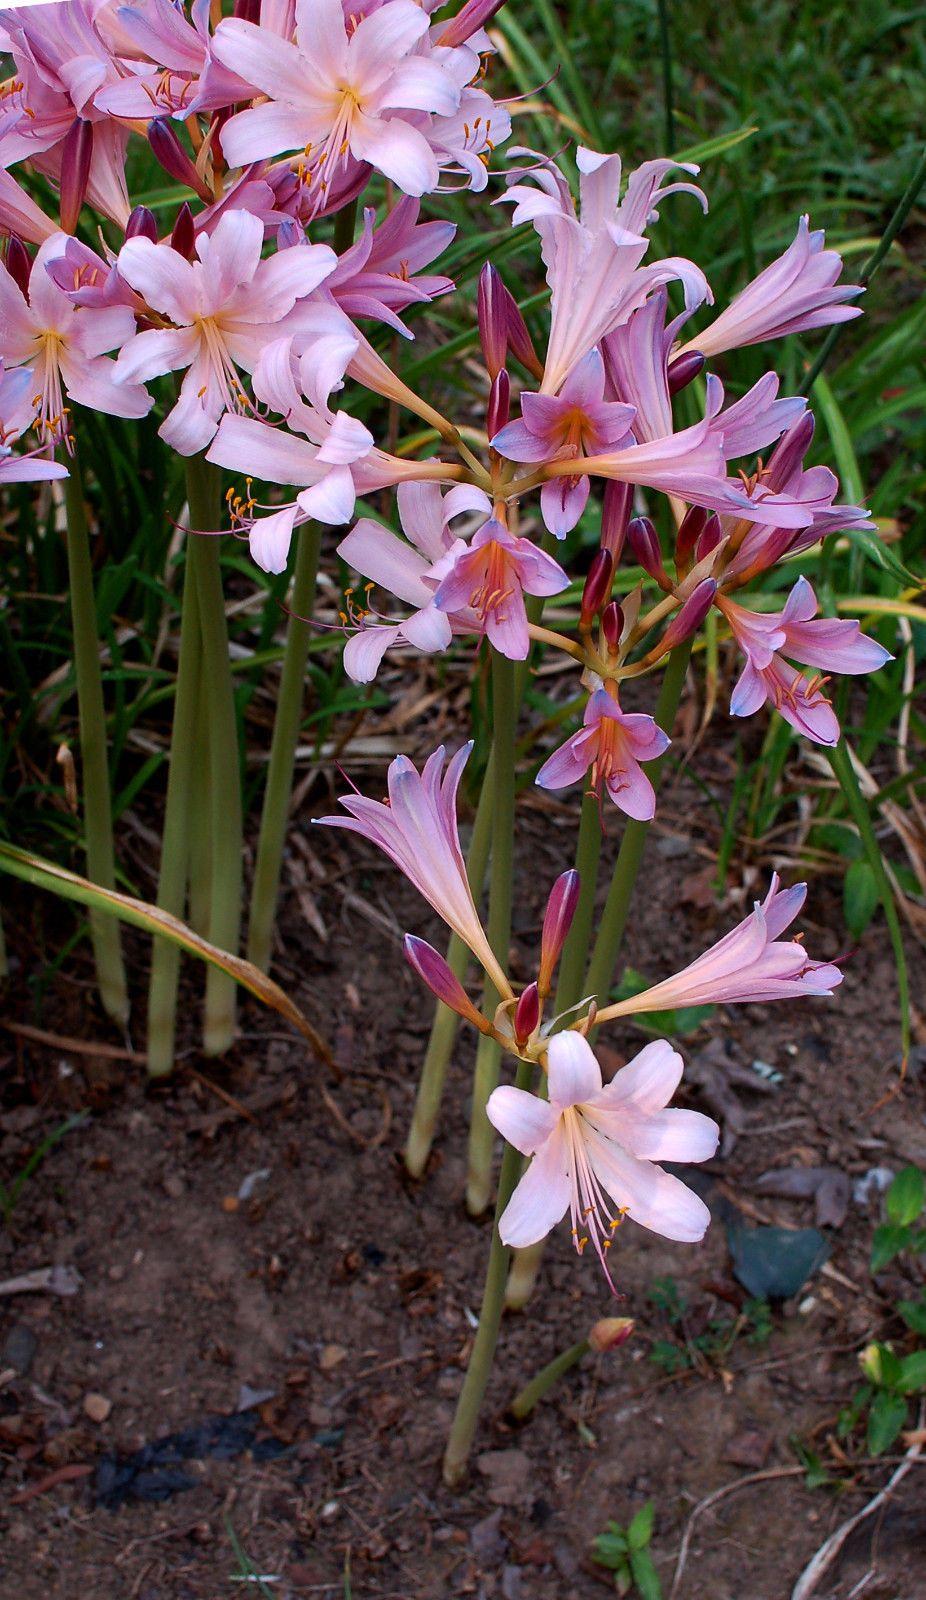 Naked Lady Lilies | Amaryllis belladonna - Belladonna Lily